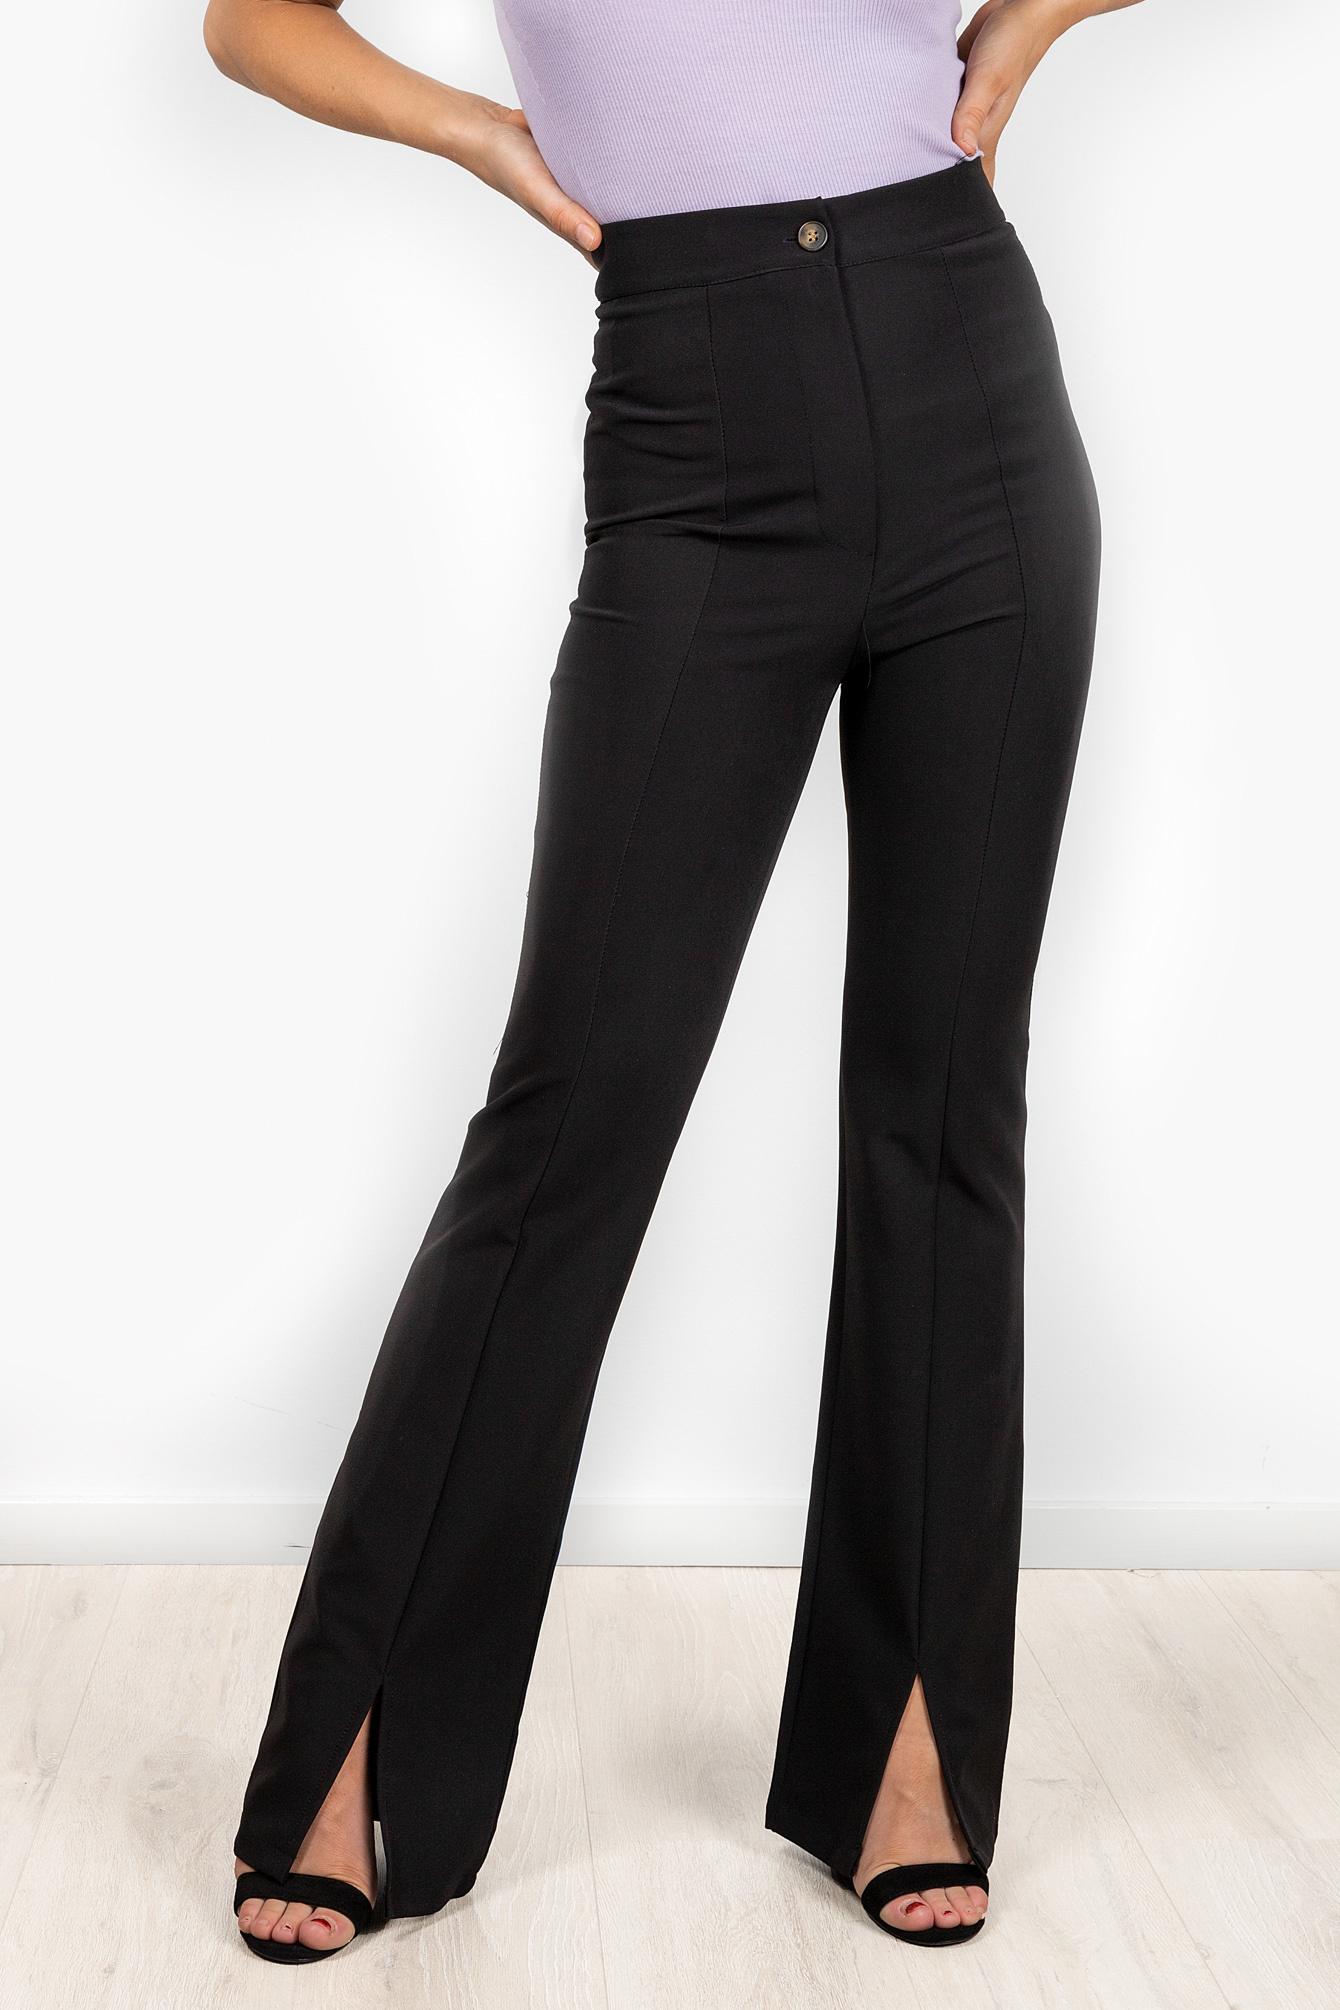 Pantalon Valerie zwart